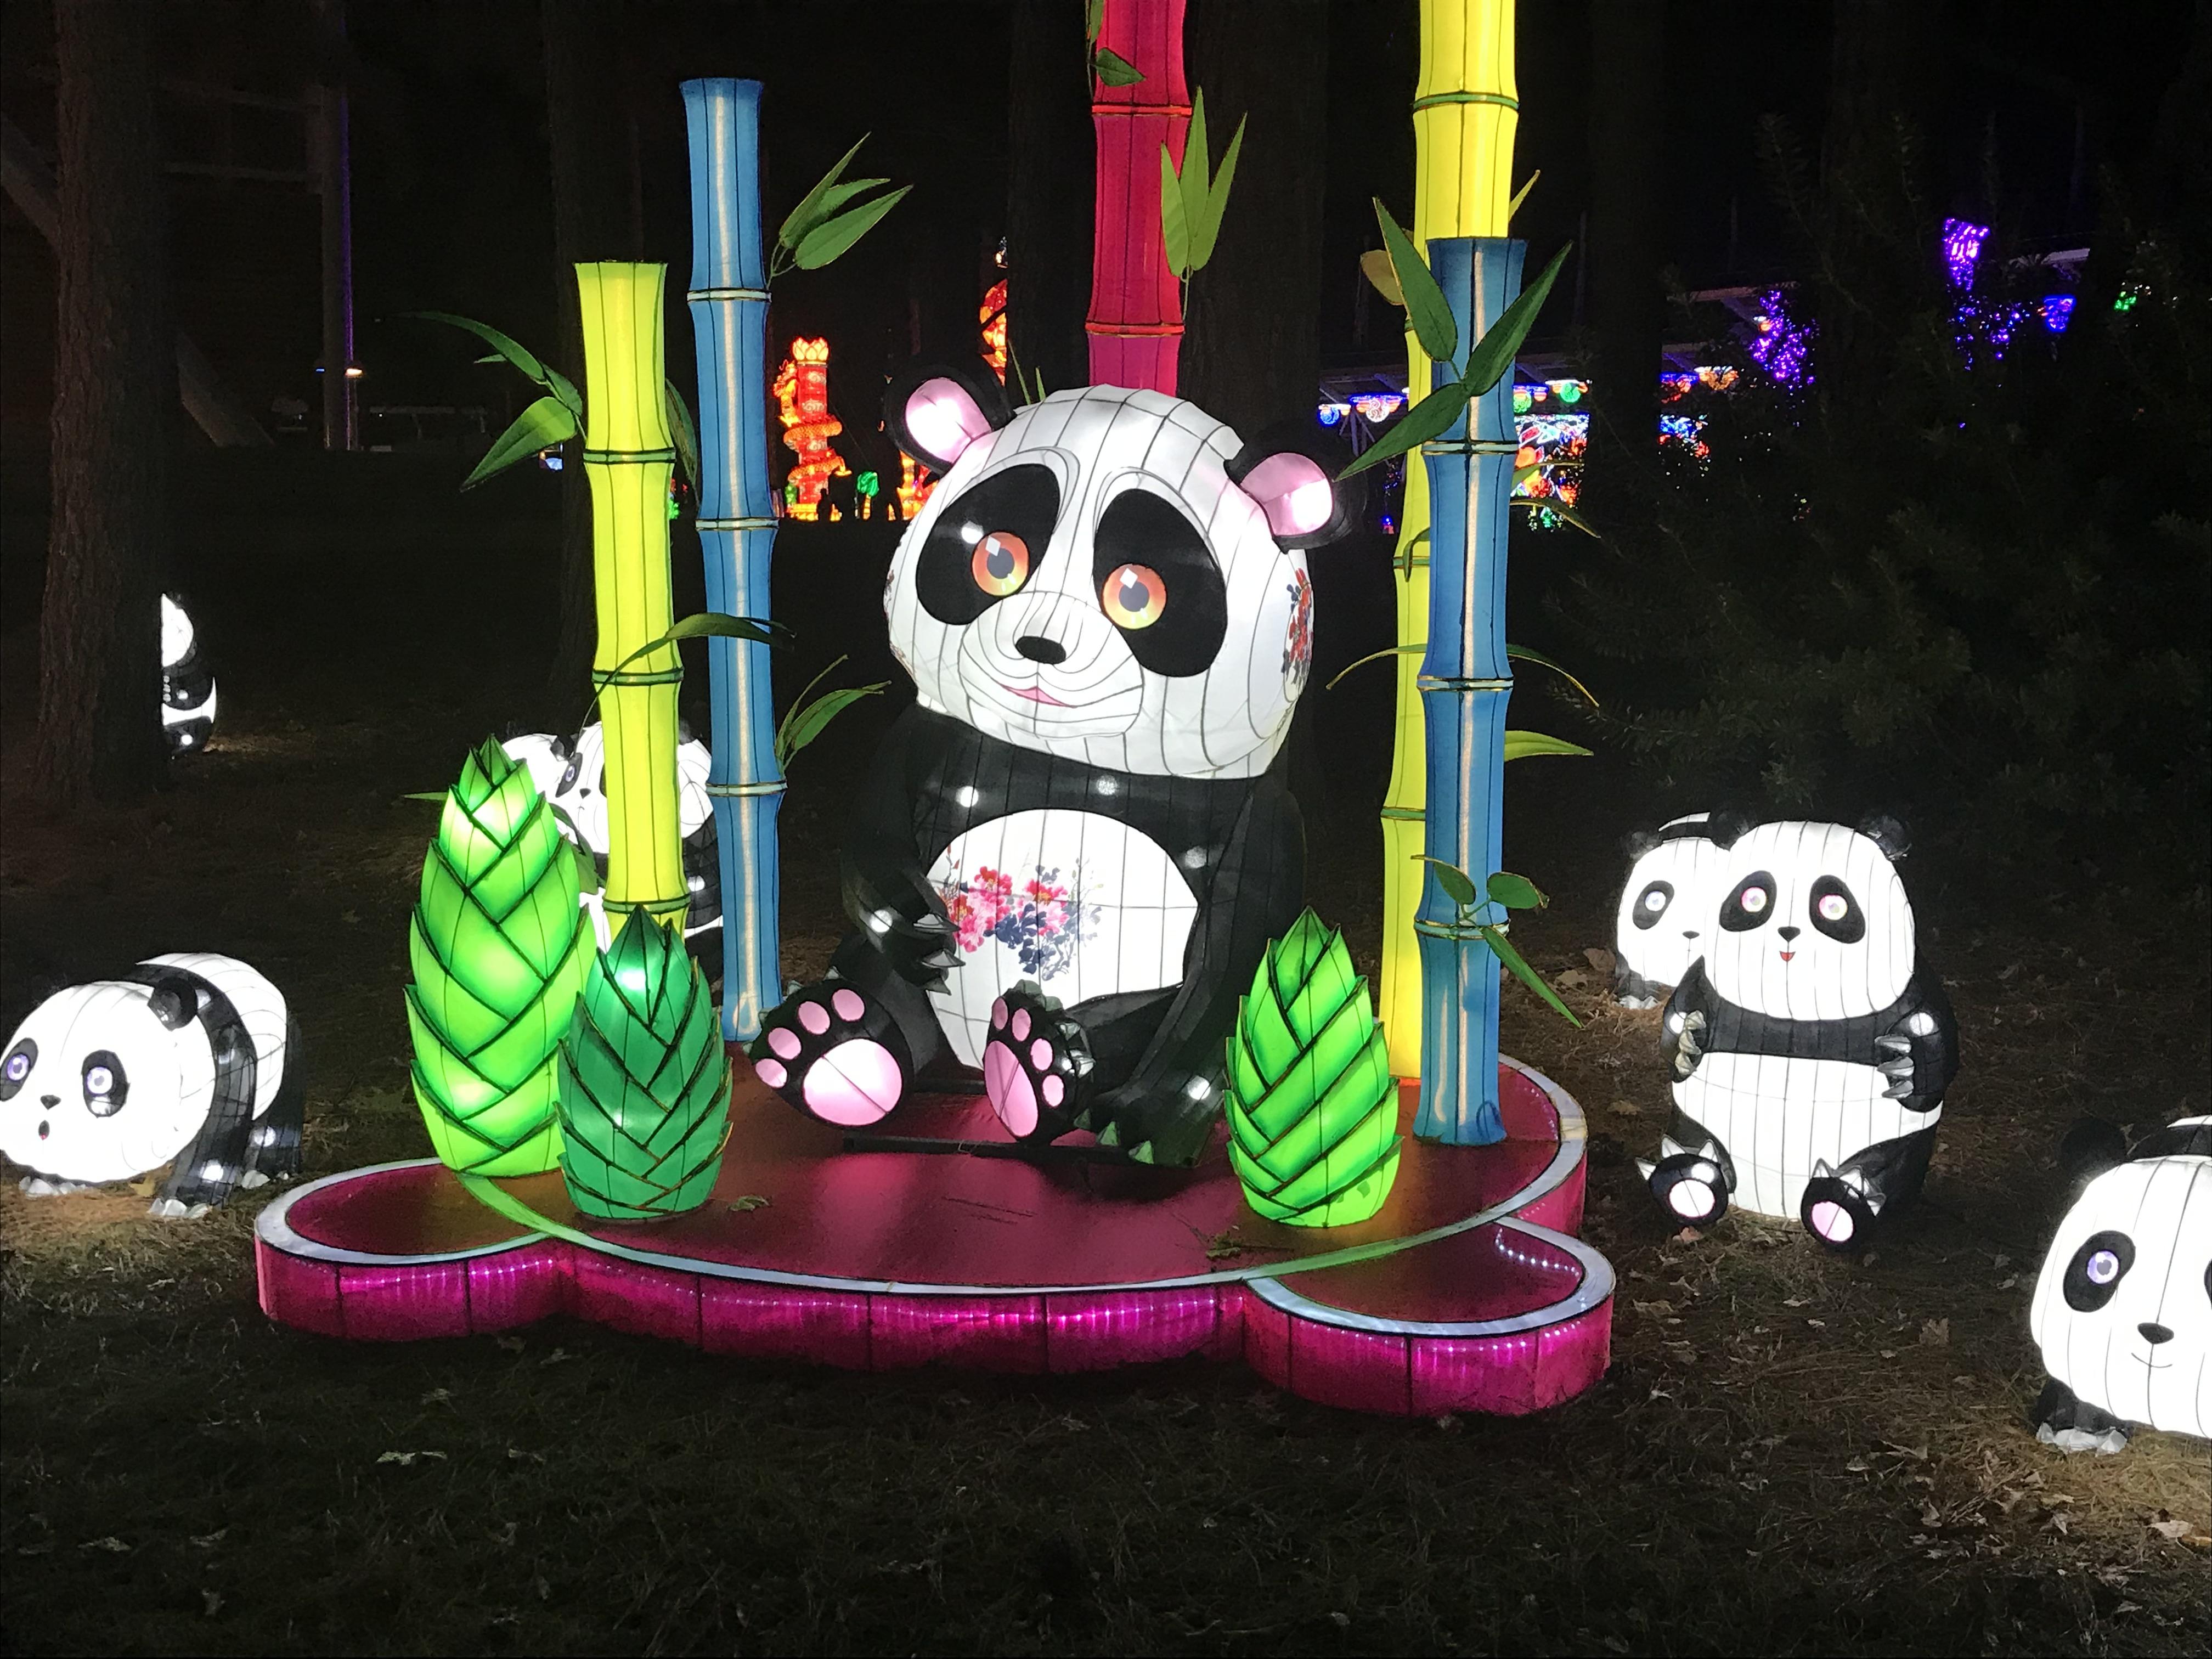 <div class='meta'><div class='origin-logo' data-origin='none'></div><span class='caption-text' data-credit=''>NC Chinese Lantern Festival</span></div>